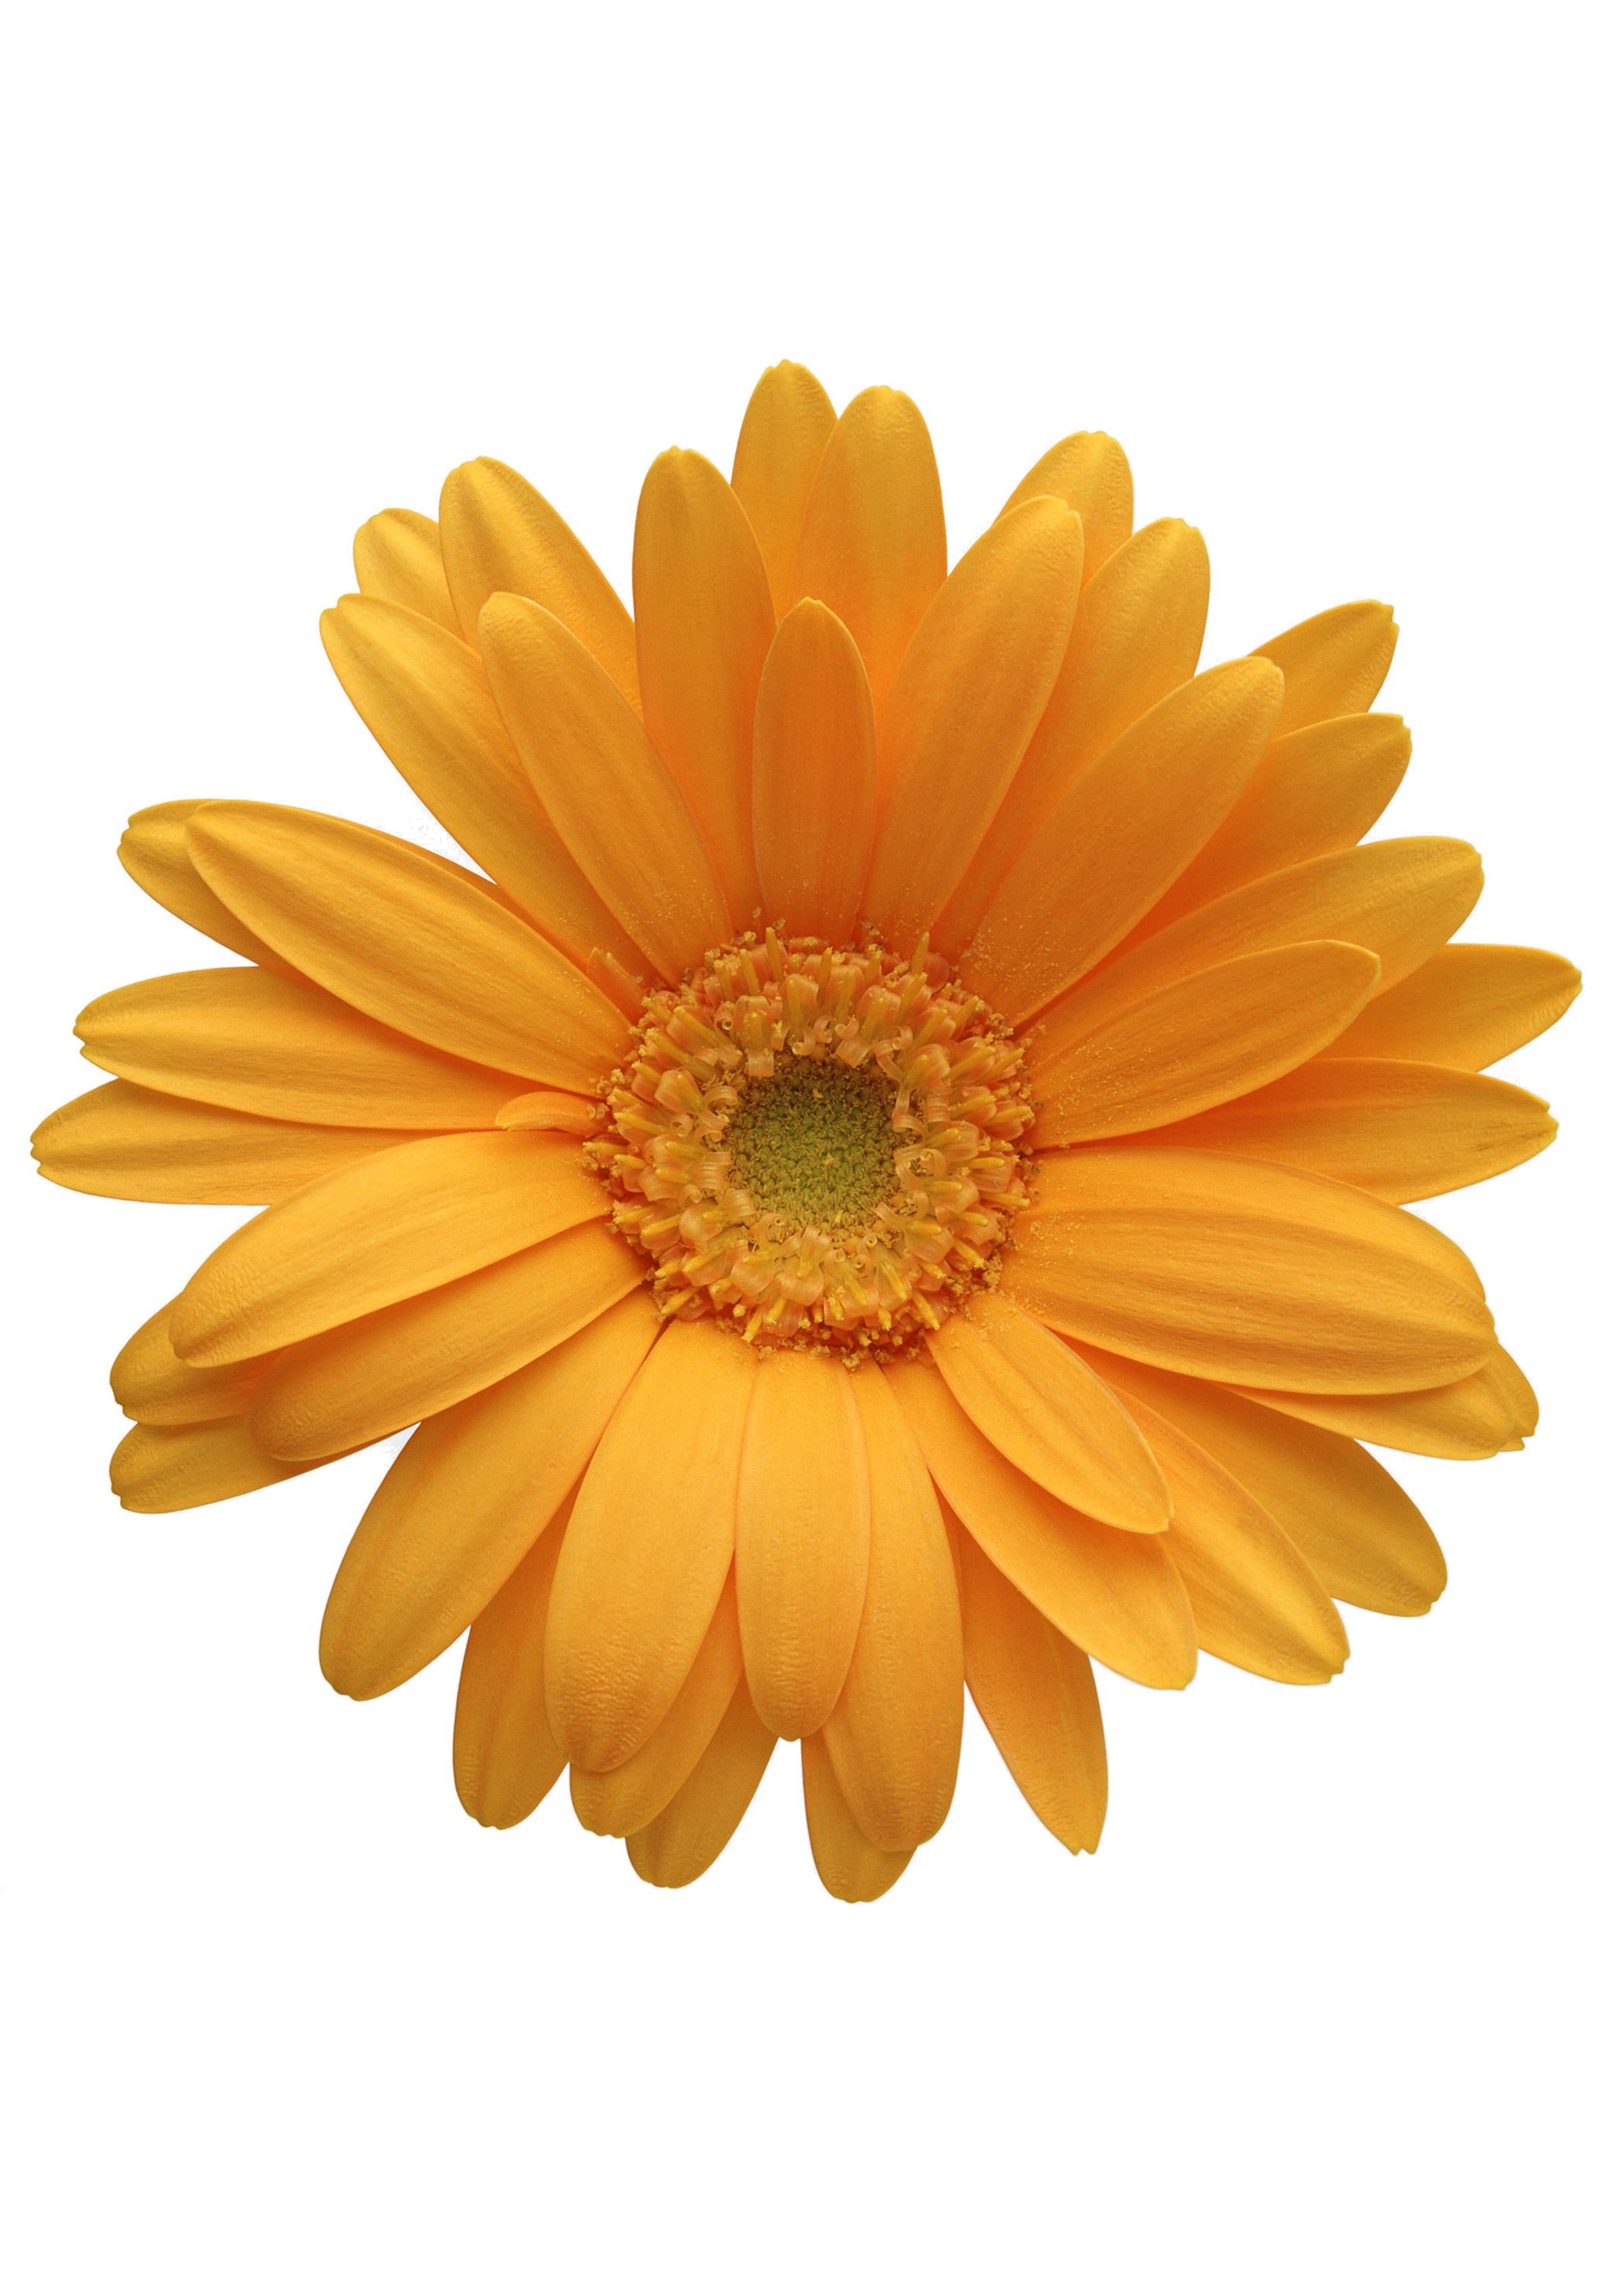 Daisy clipart nature transparent. Flower orange transvaal clip